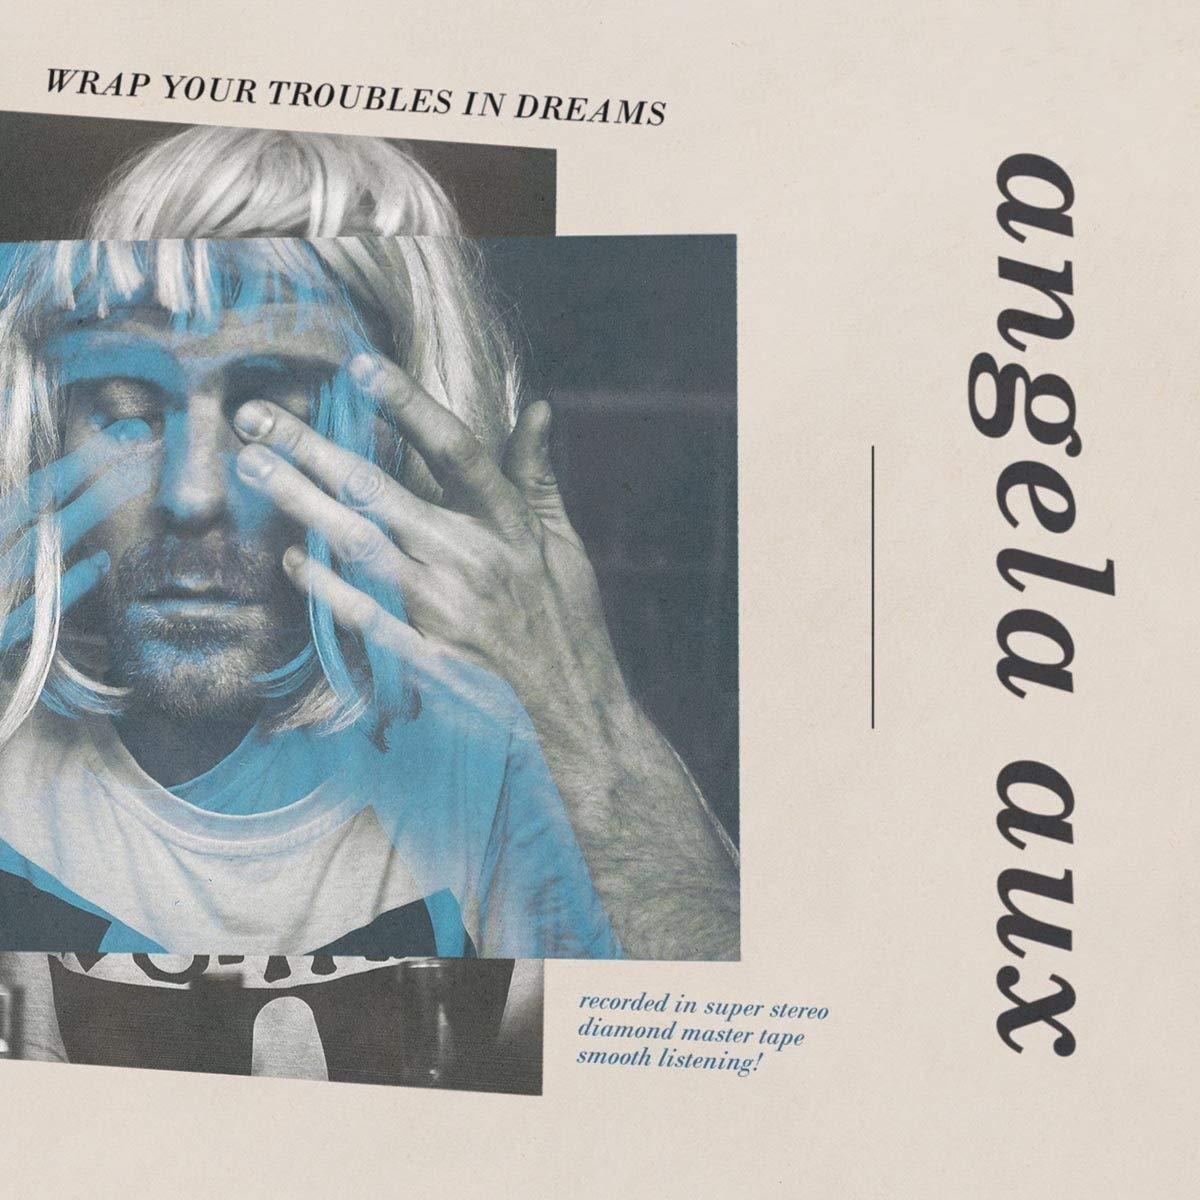 Angela Aux - Wrap Your Troubles In Dreams